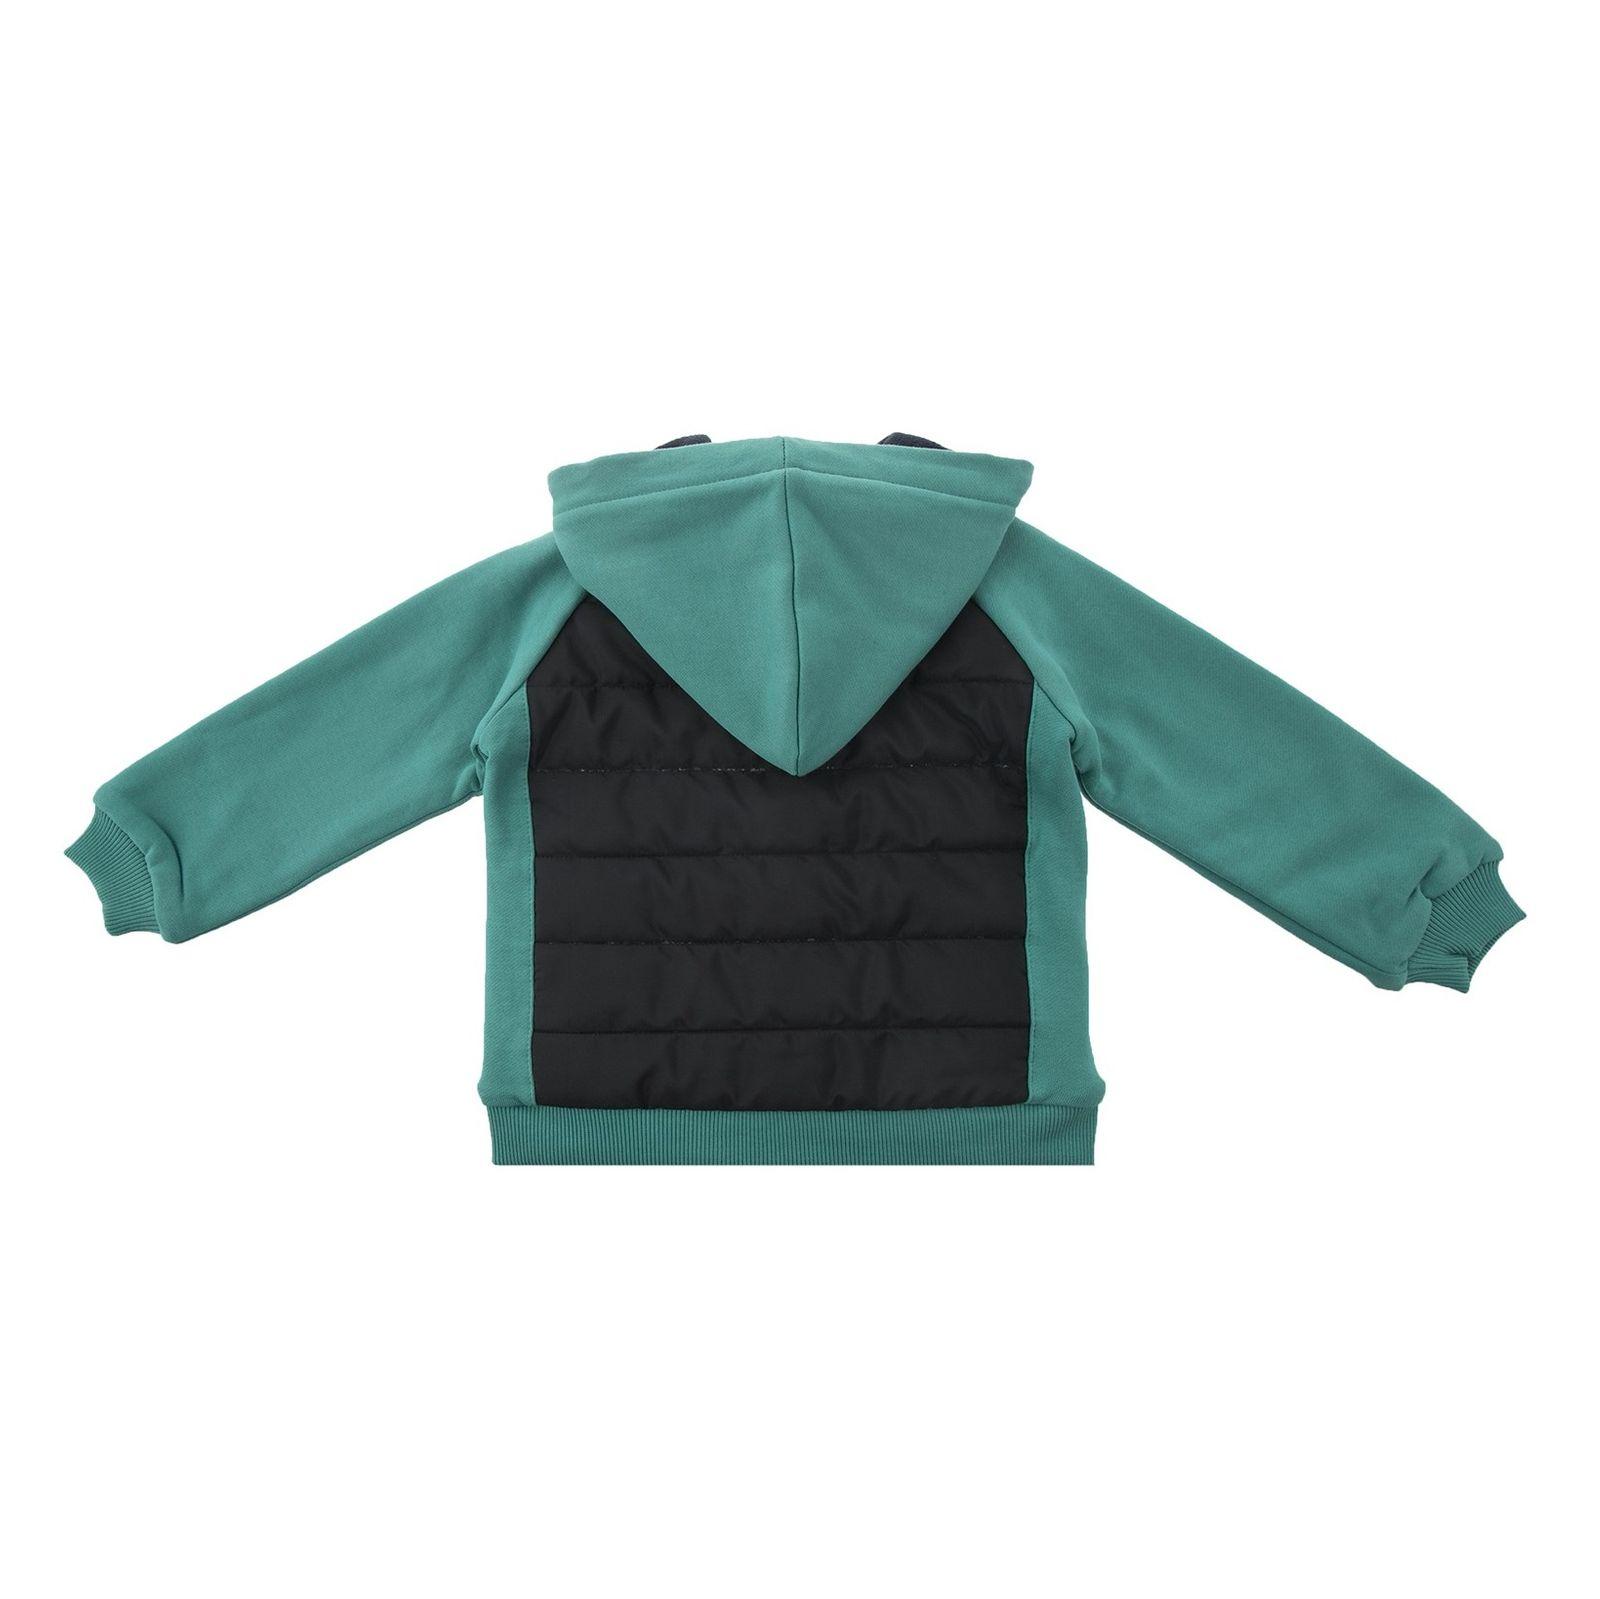 کاپشن نخی کلاه دار دخترانه - پیانو - سبز آبی - 2